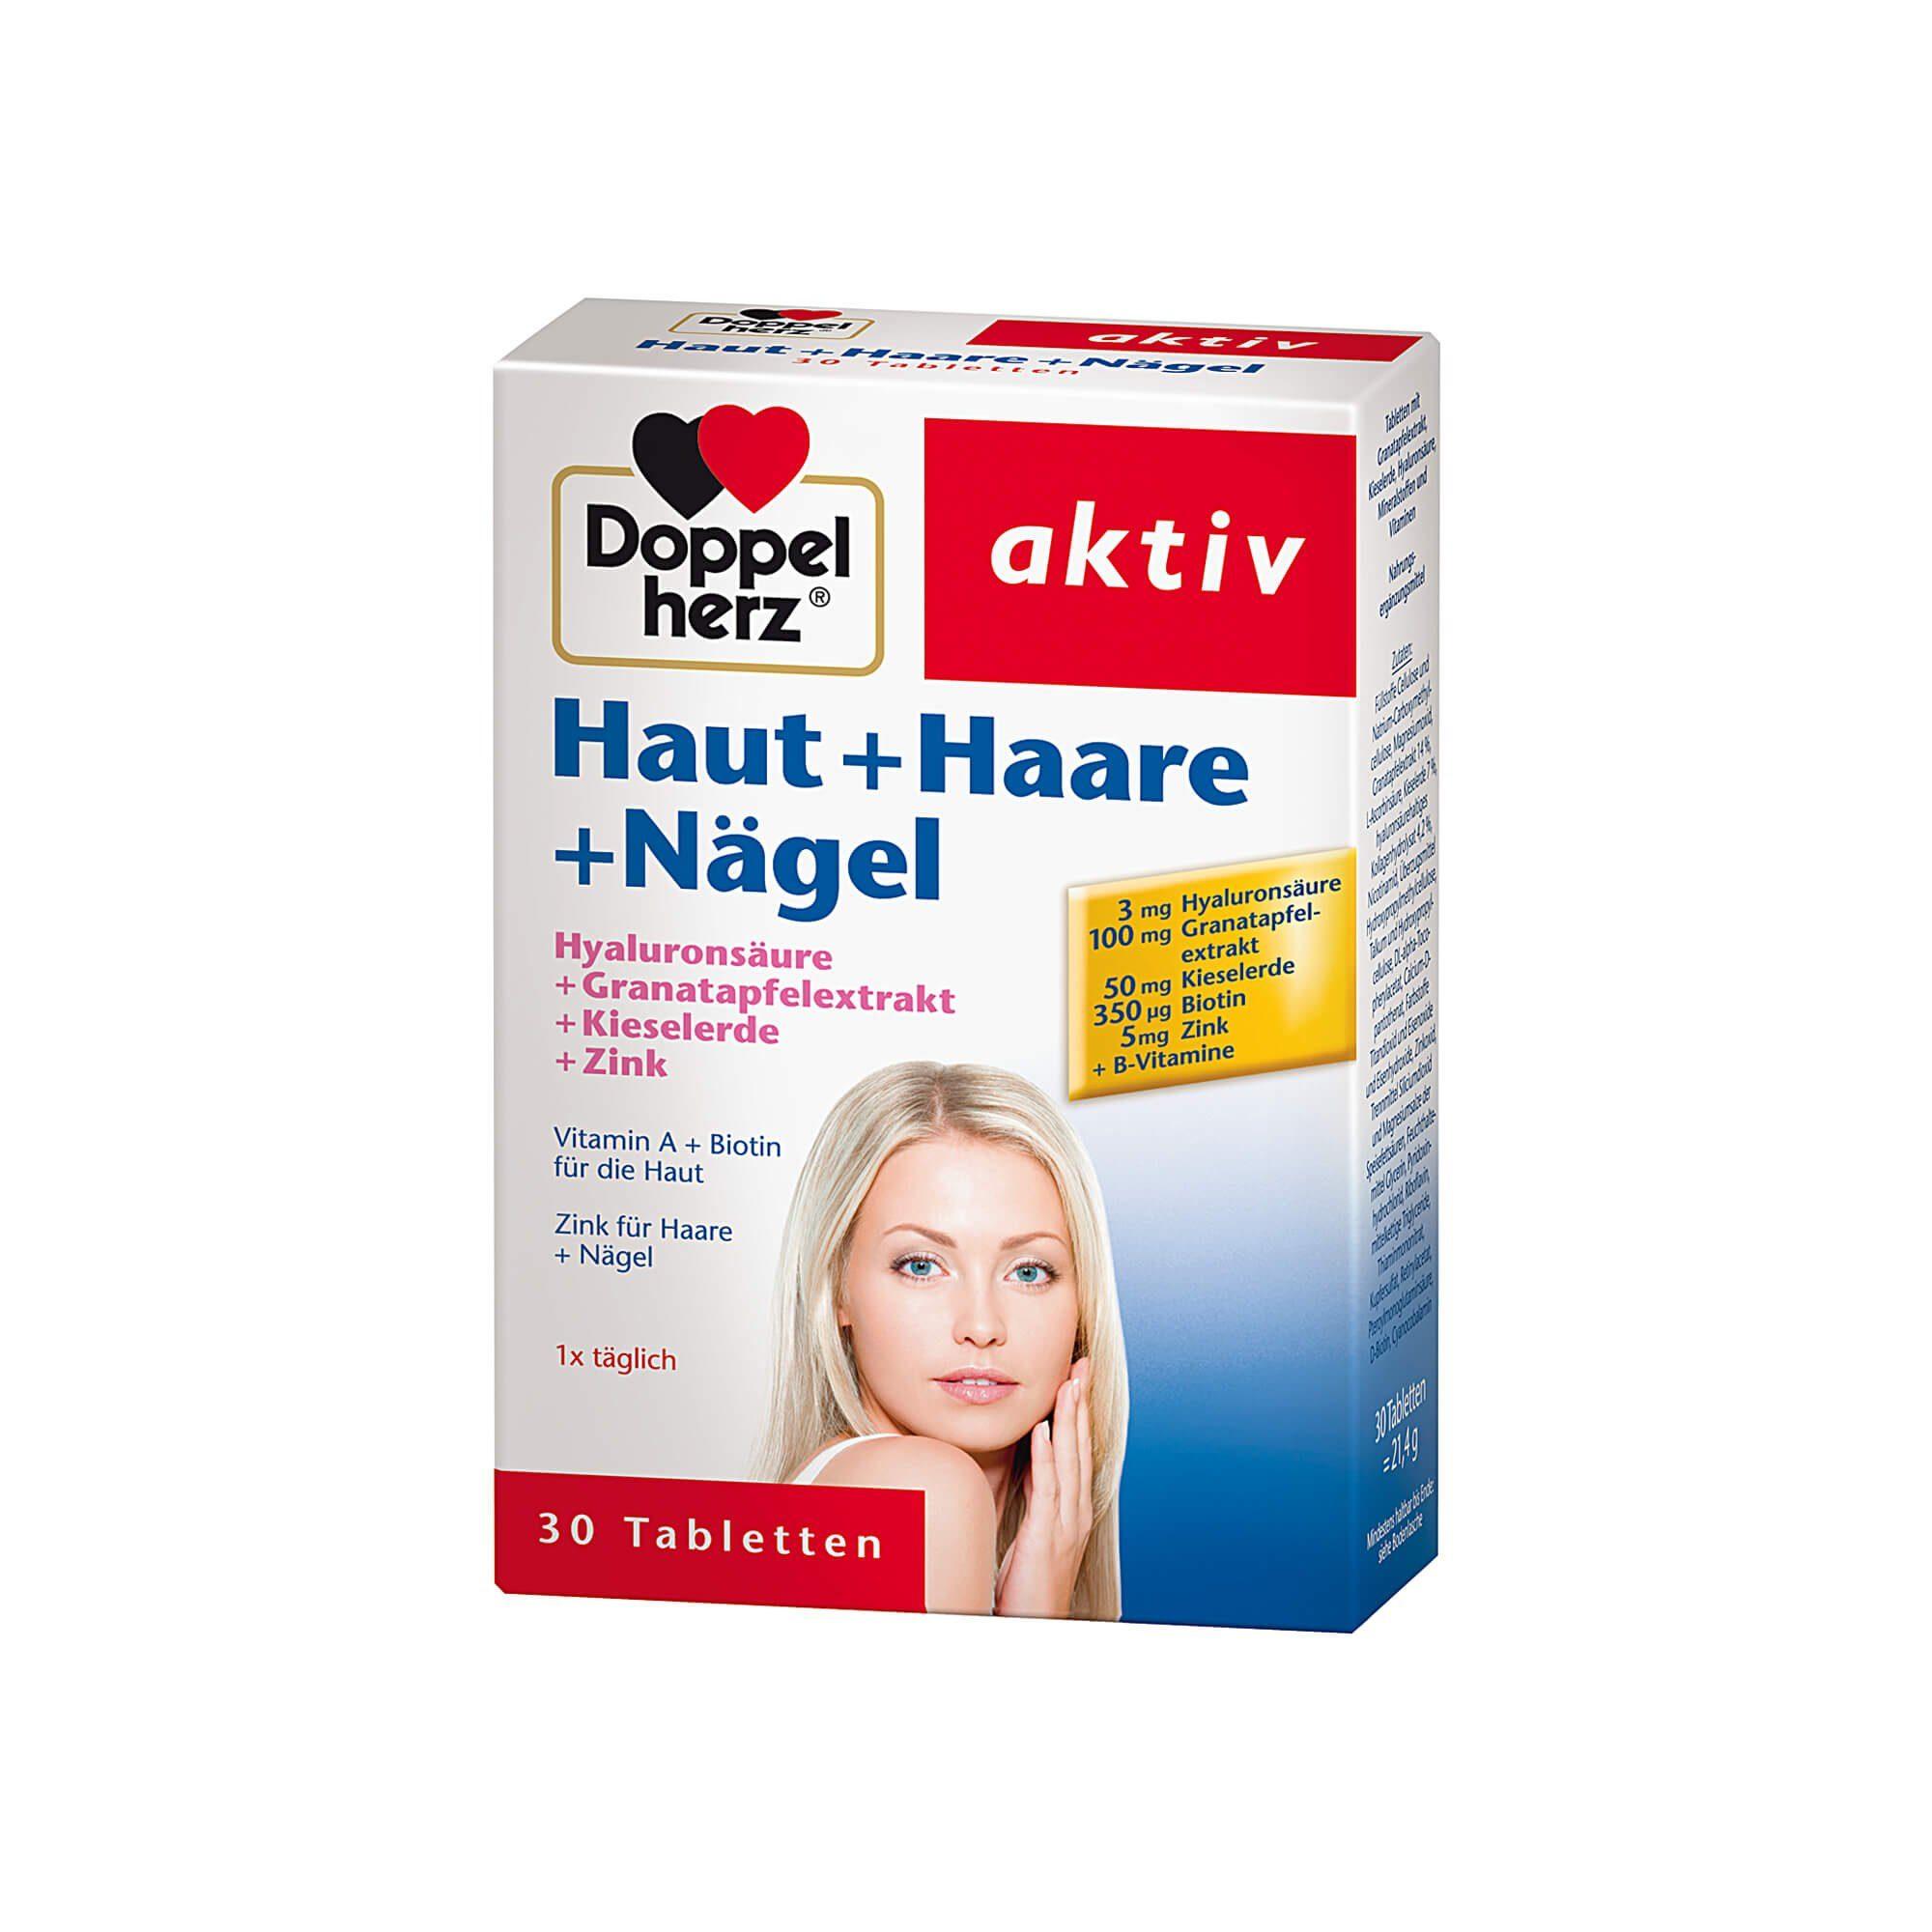 Doppelherz Haut+Haare+Nägel Tabletten, 30 St